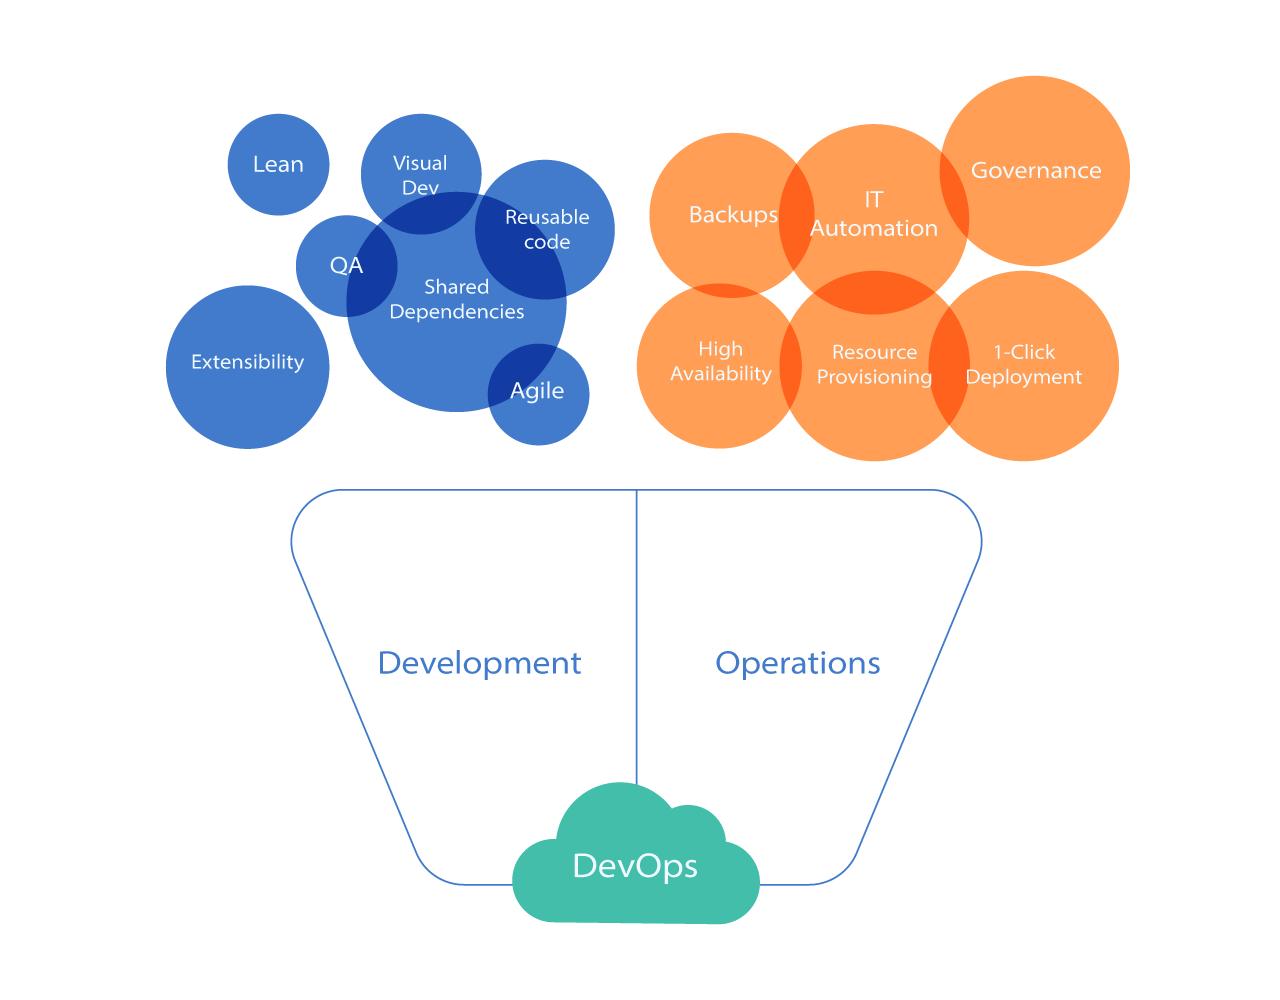 Development + Operations = DevOps